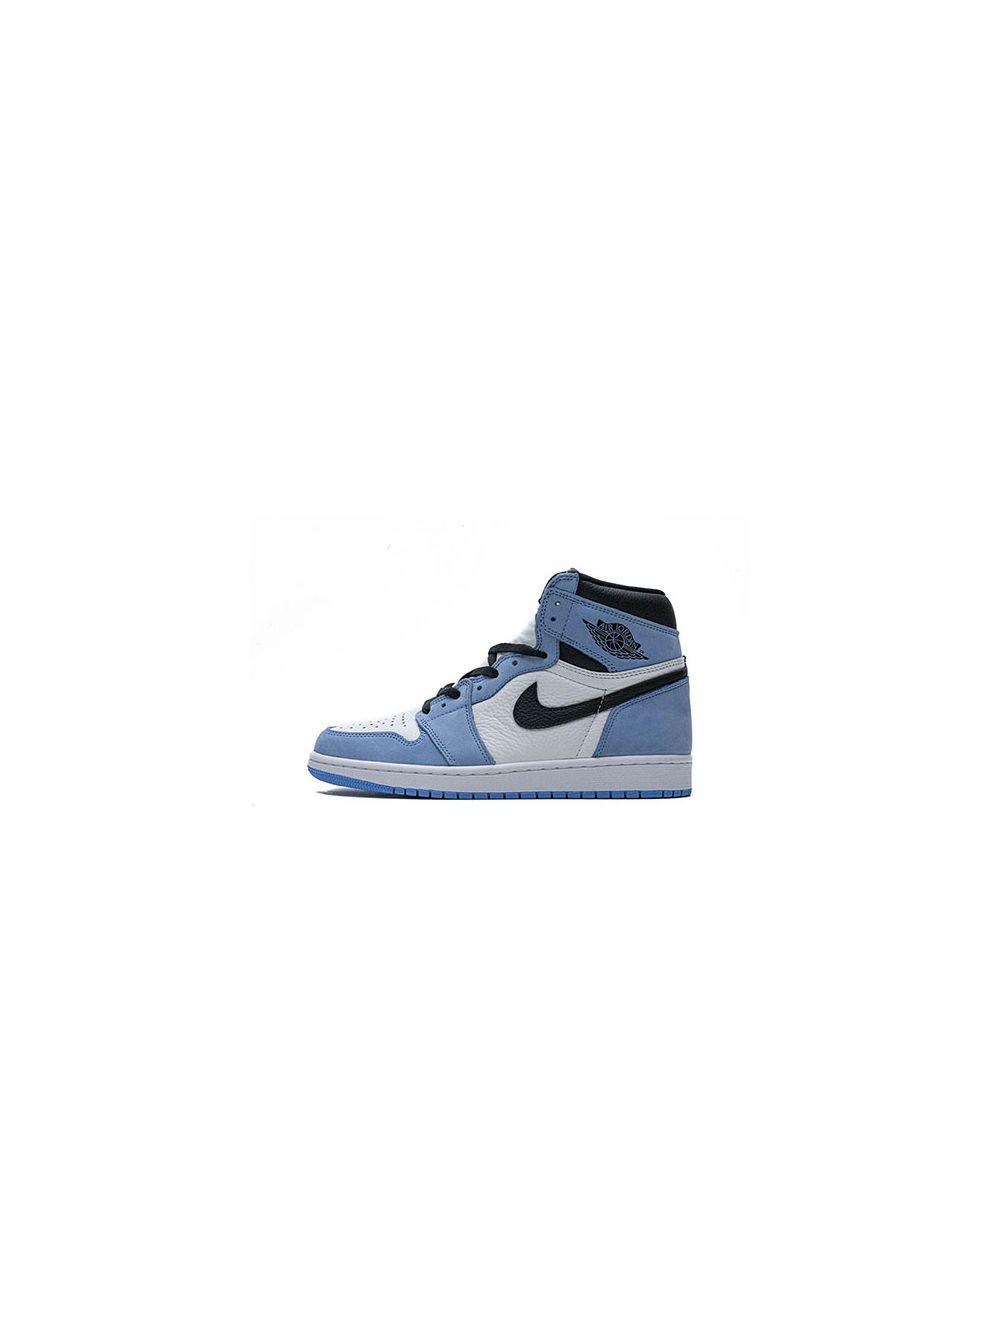 Fake Jordan 1 High University Blue